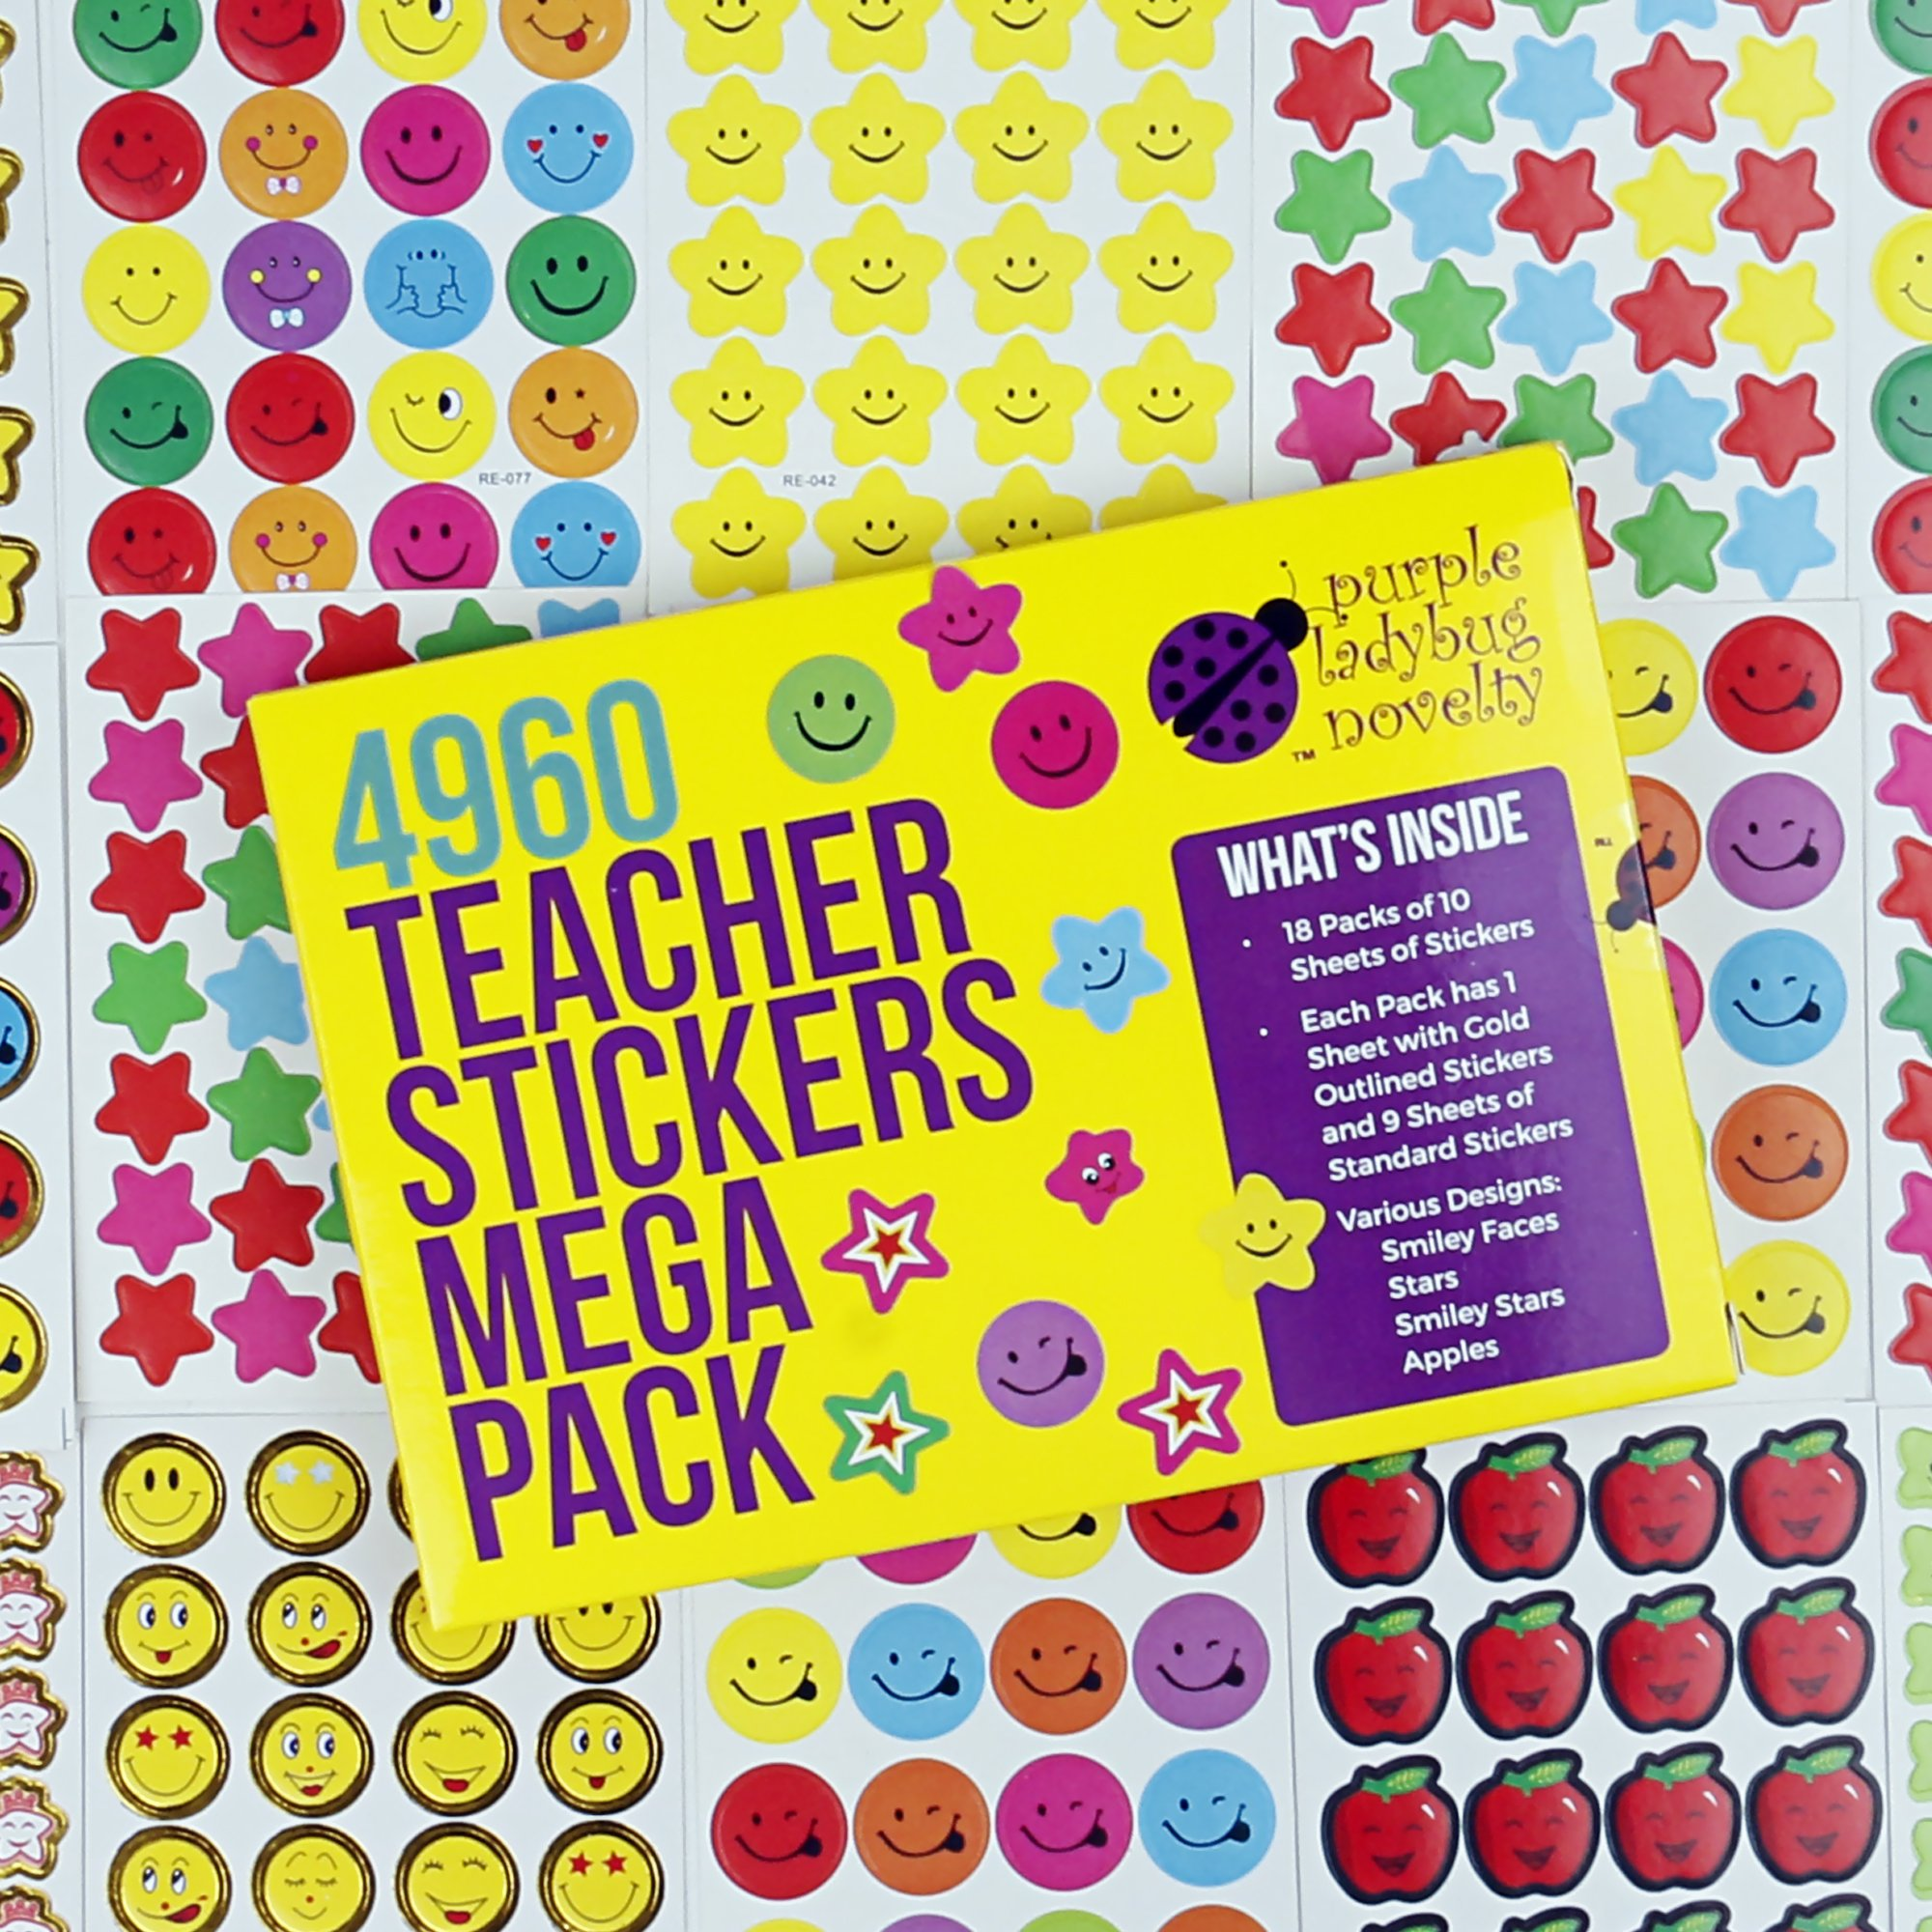 Purple Ladybug Novelty Incentive Classroom